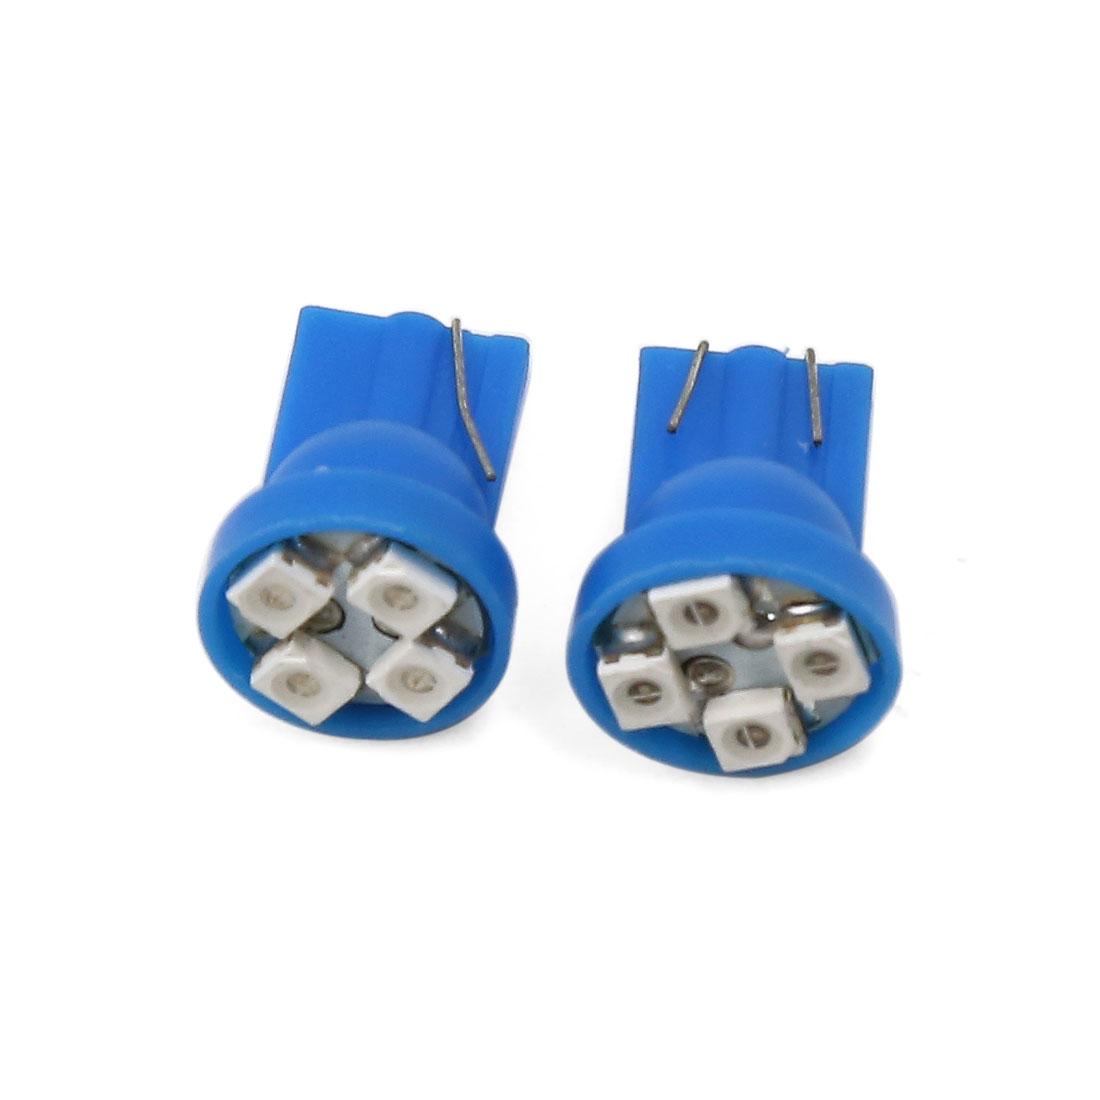 2 Pcs Blue T10 4 LED 1210 SMD Car Wedge Dash Light Bulbs Lamp DC 12V Interior